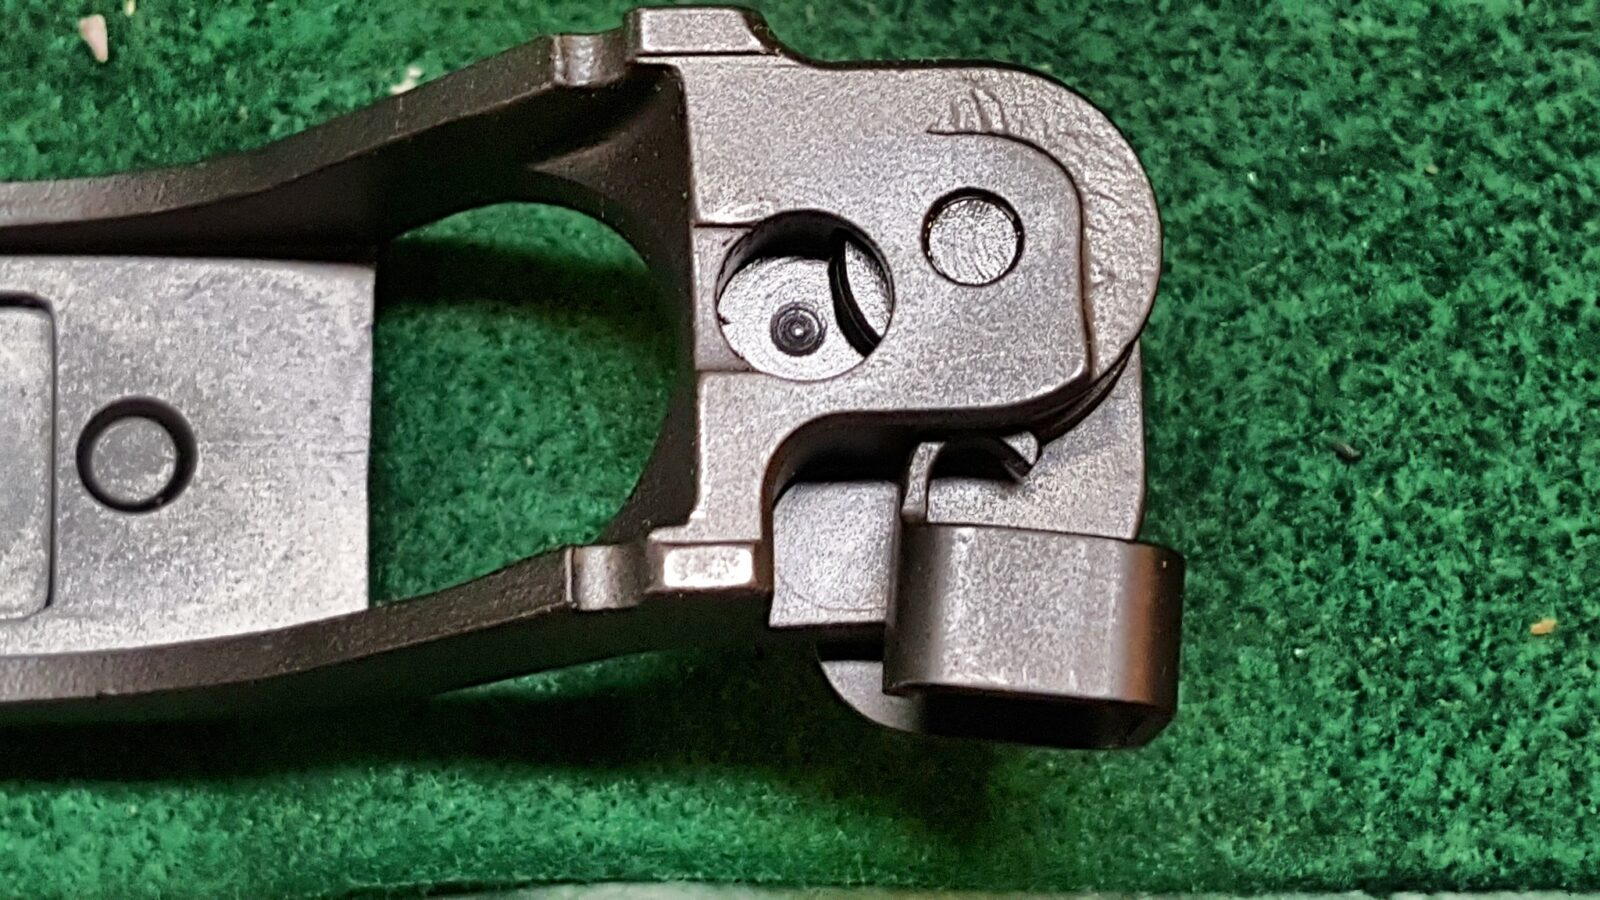 Assembling A Beryl-ish AK From A WBP Kit – Part 7